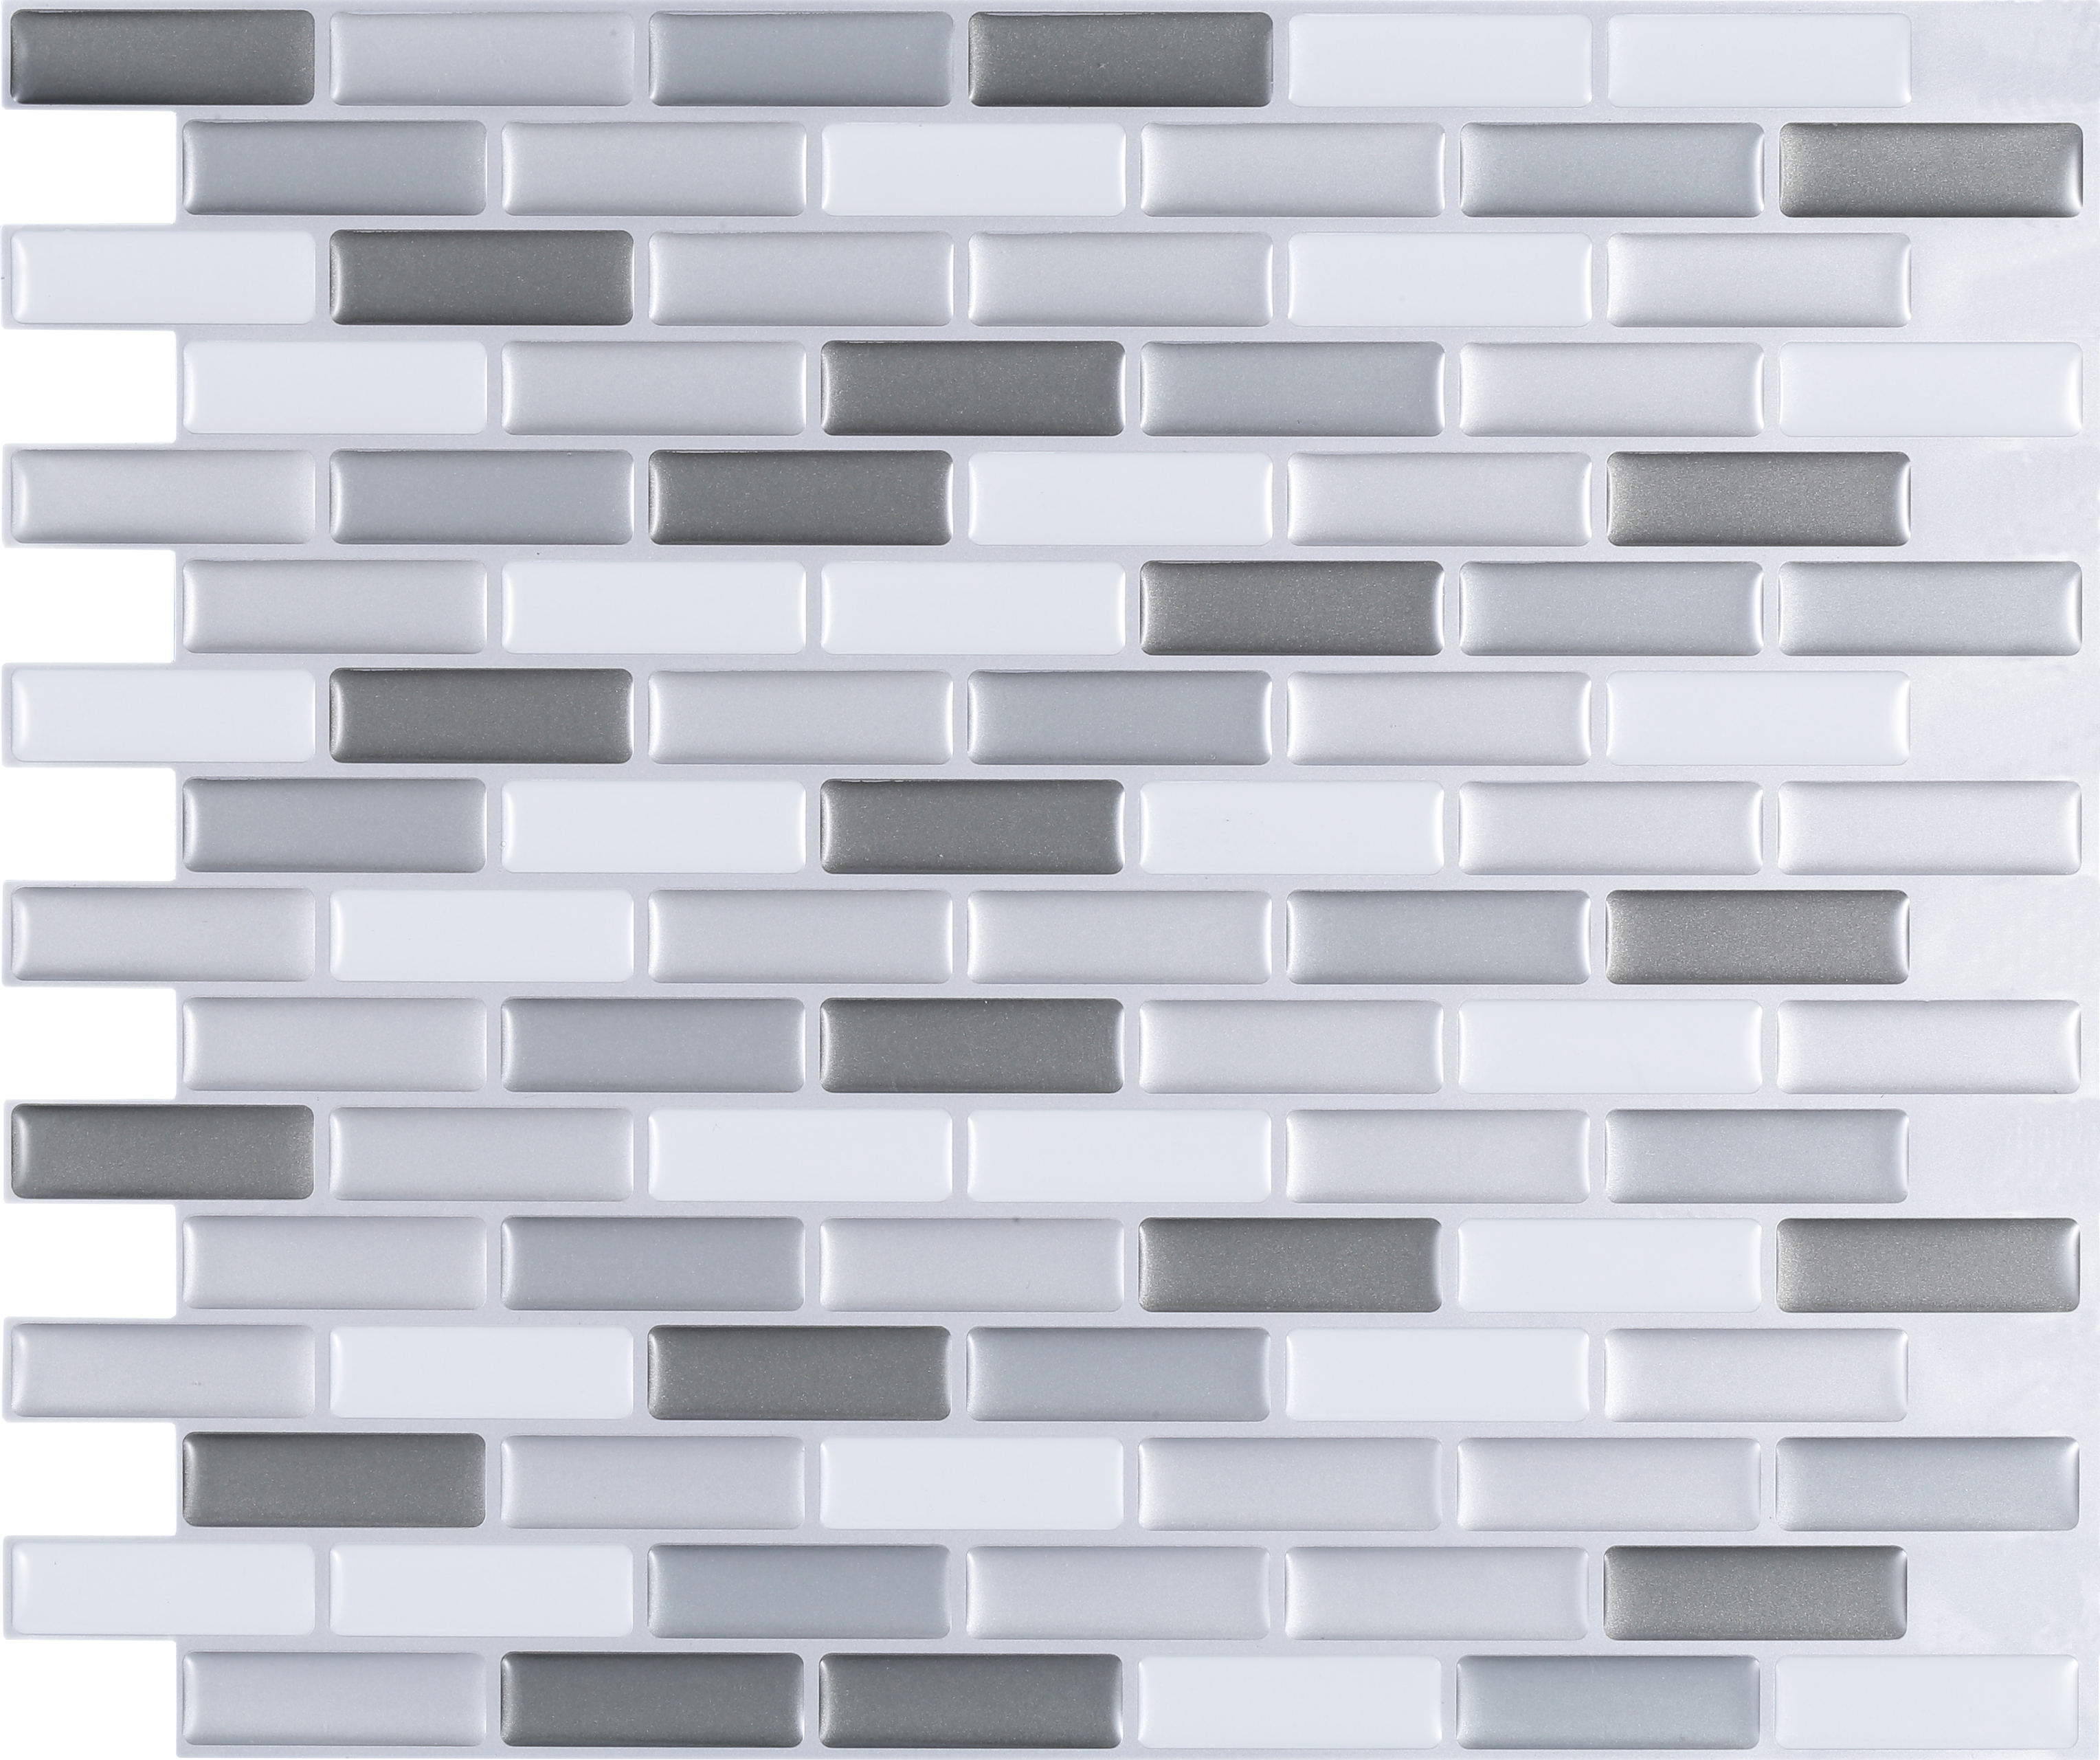 Peel stick 3d mosaic tile wm 108c for 3d peel and stick wallpaper